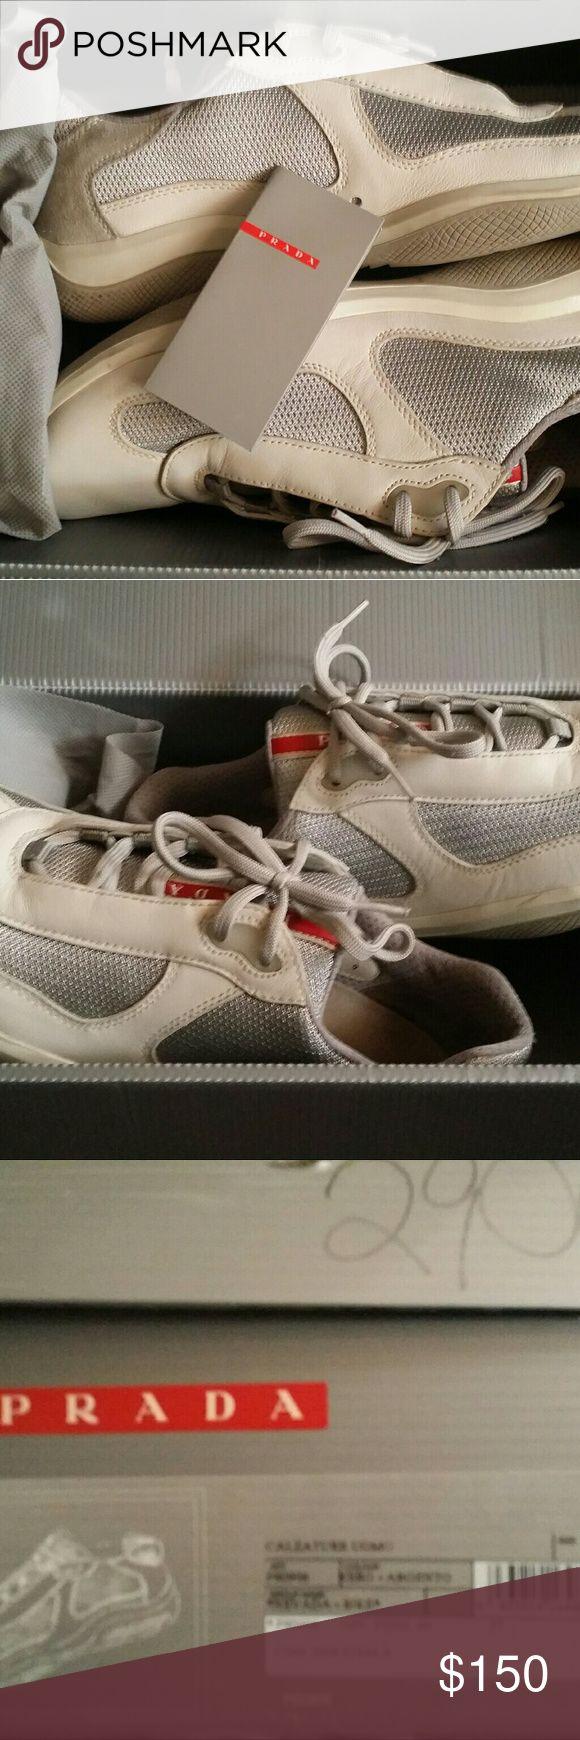 Prada (CALZATURE) Sneakers men's 9 Gently used prada sneakers Prada Shoes Sneakers